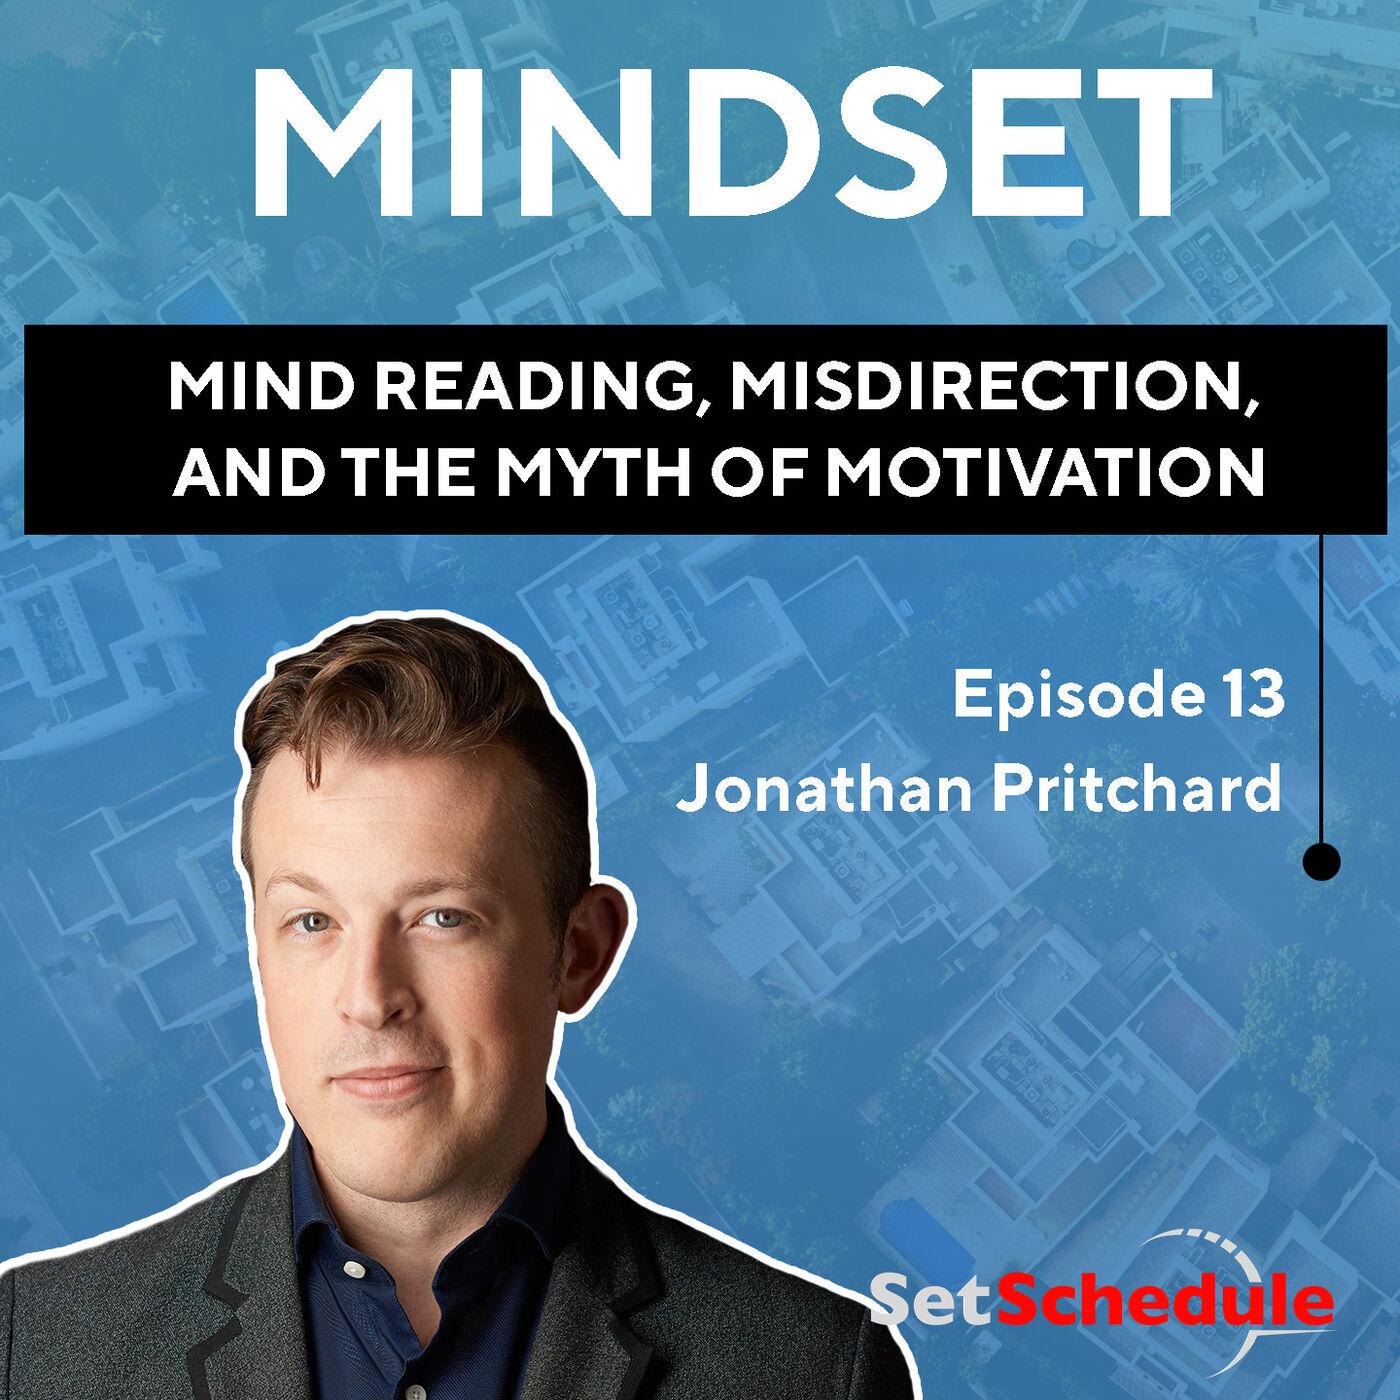 Mind Reading, Misdirection, and the Myth of Motivation - Jonathan Pritchard